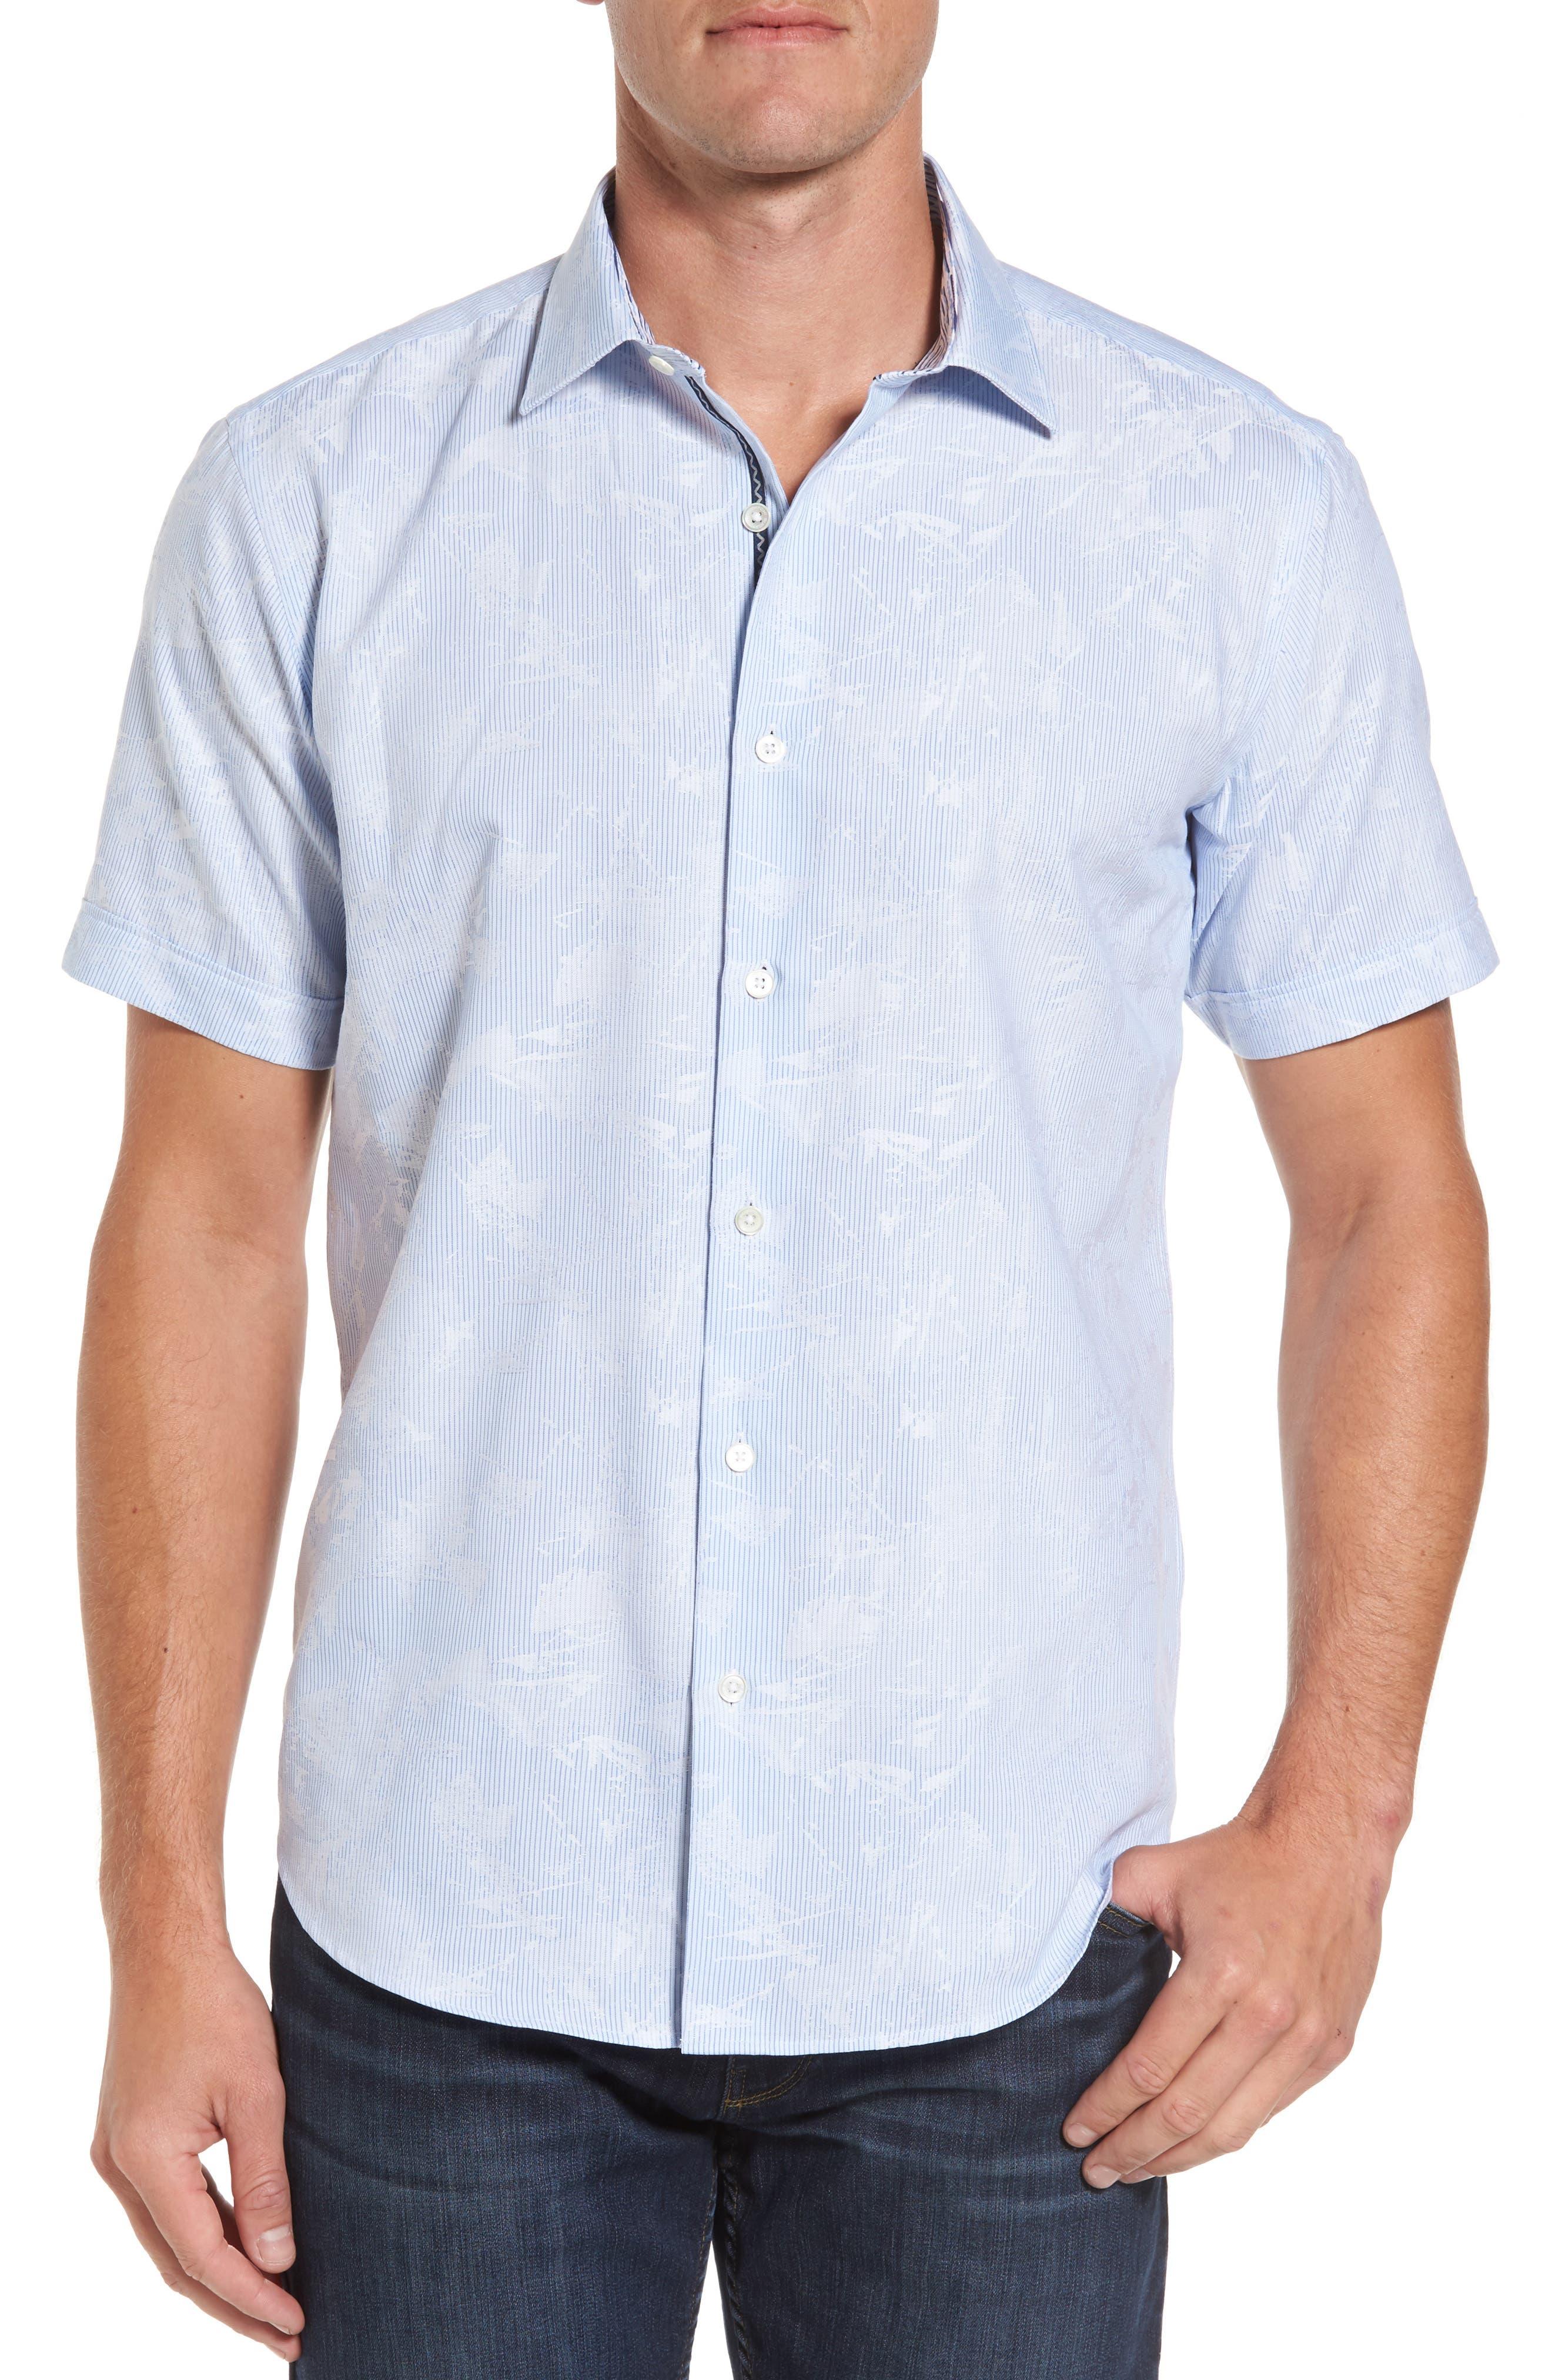 Main Image - Bugatchi Shaped Fit Jacquard Stripe Sport Shirt